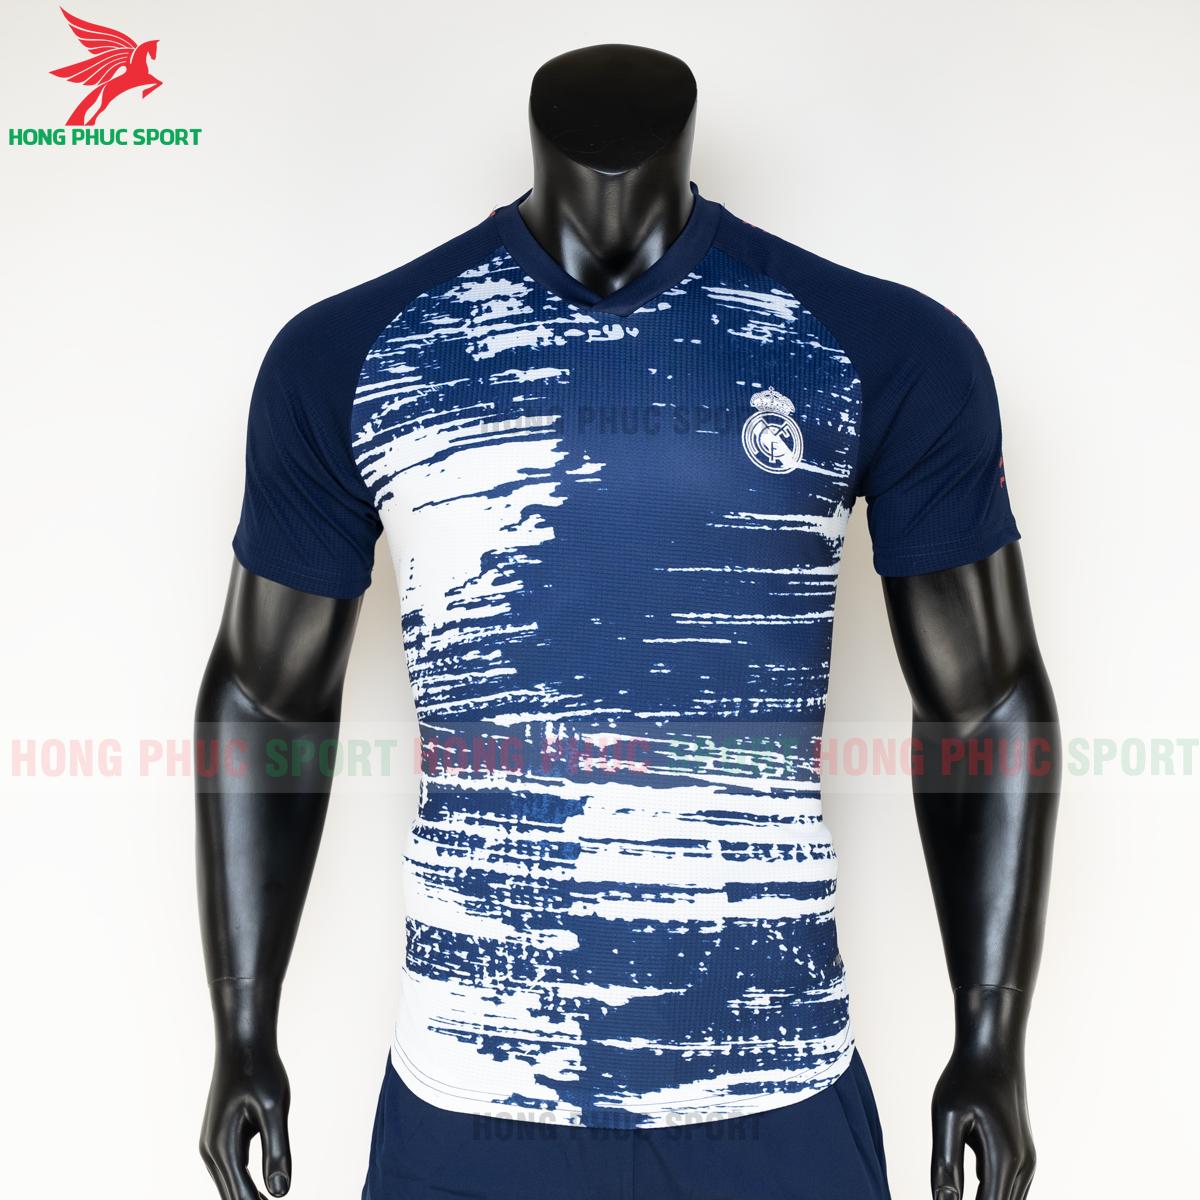 https://cdn.hongphucsport.com/unsafe/s4.shopbay.vn/files/285/ao-bong-da-real-madrid-20-21-pre-match-hang-thailand-1-5faf55e2b9603.png